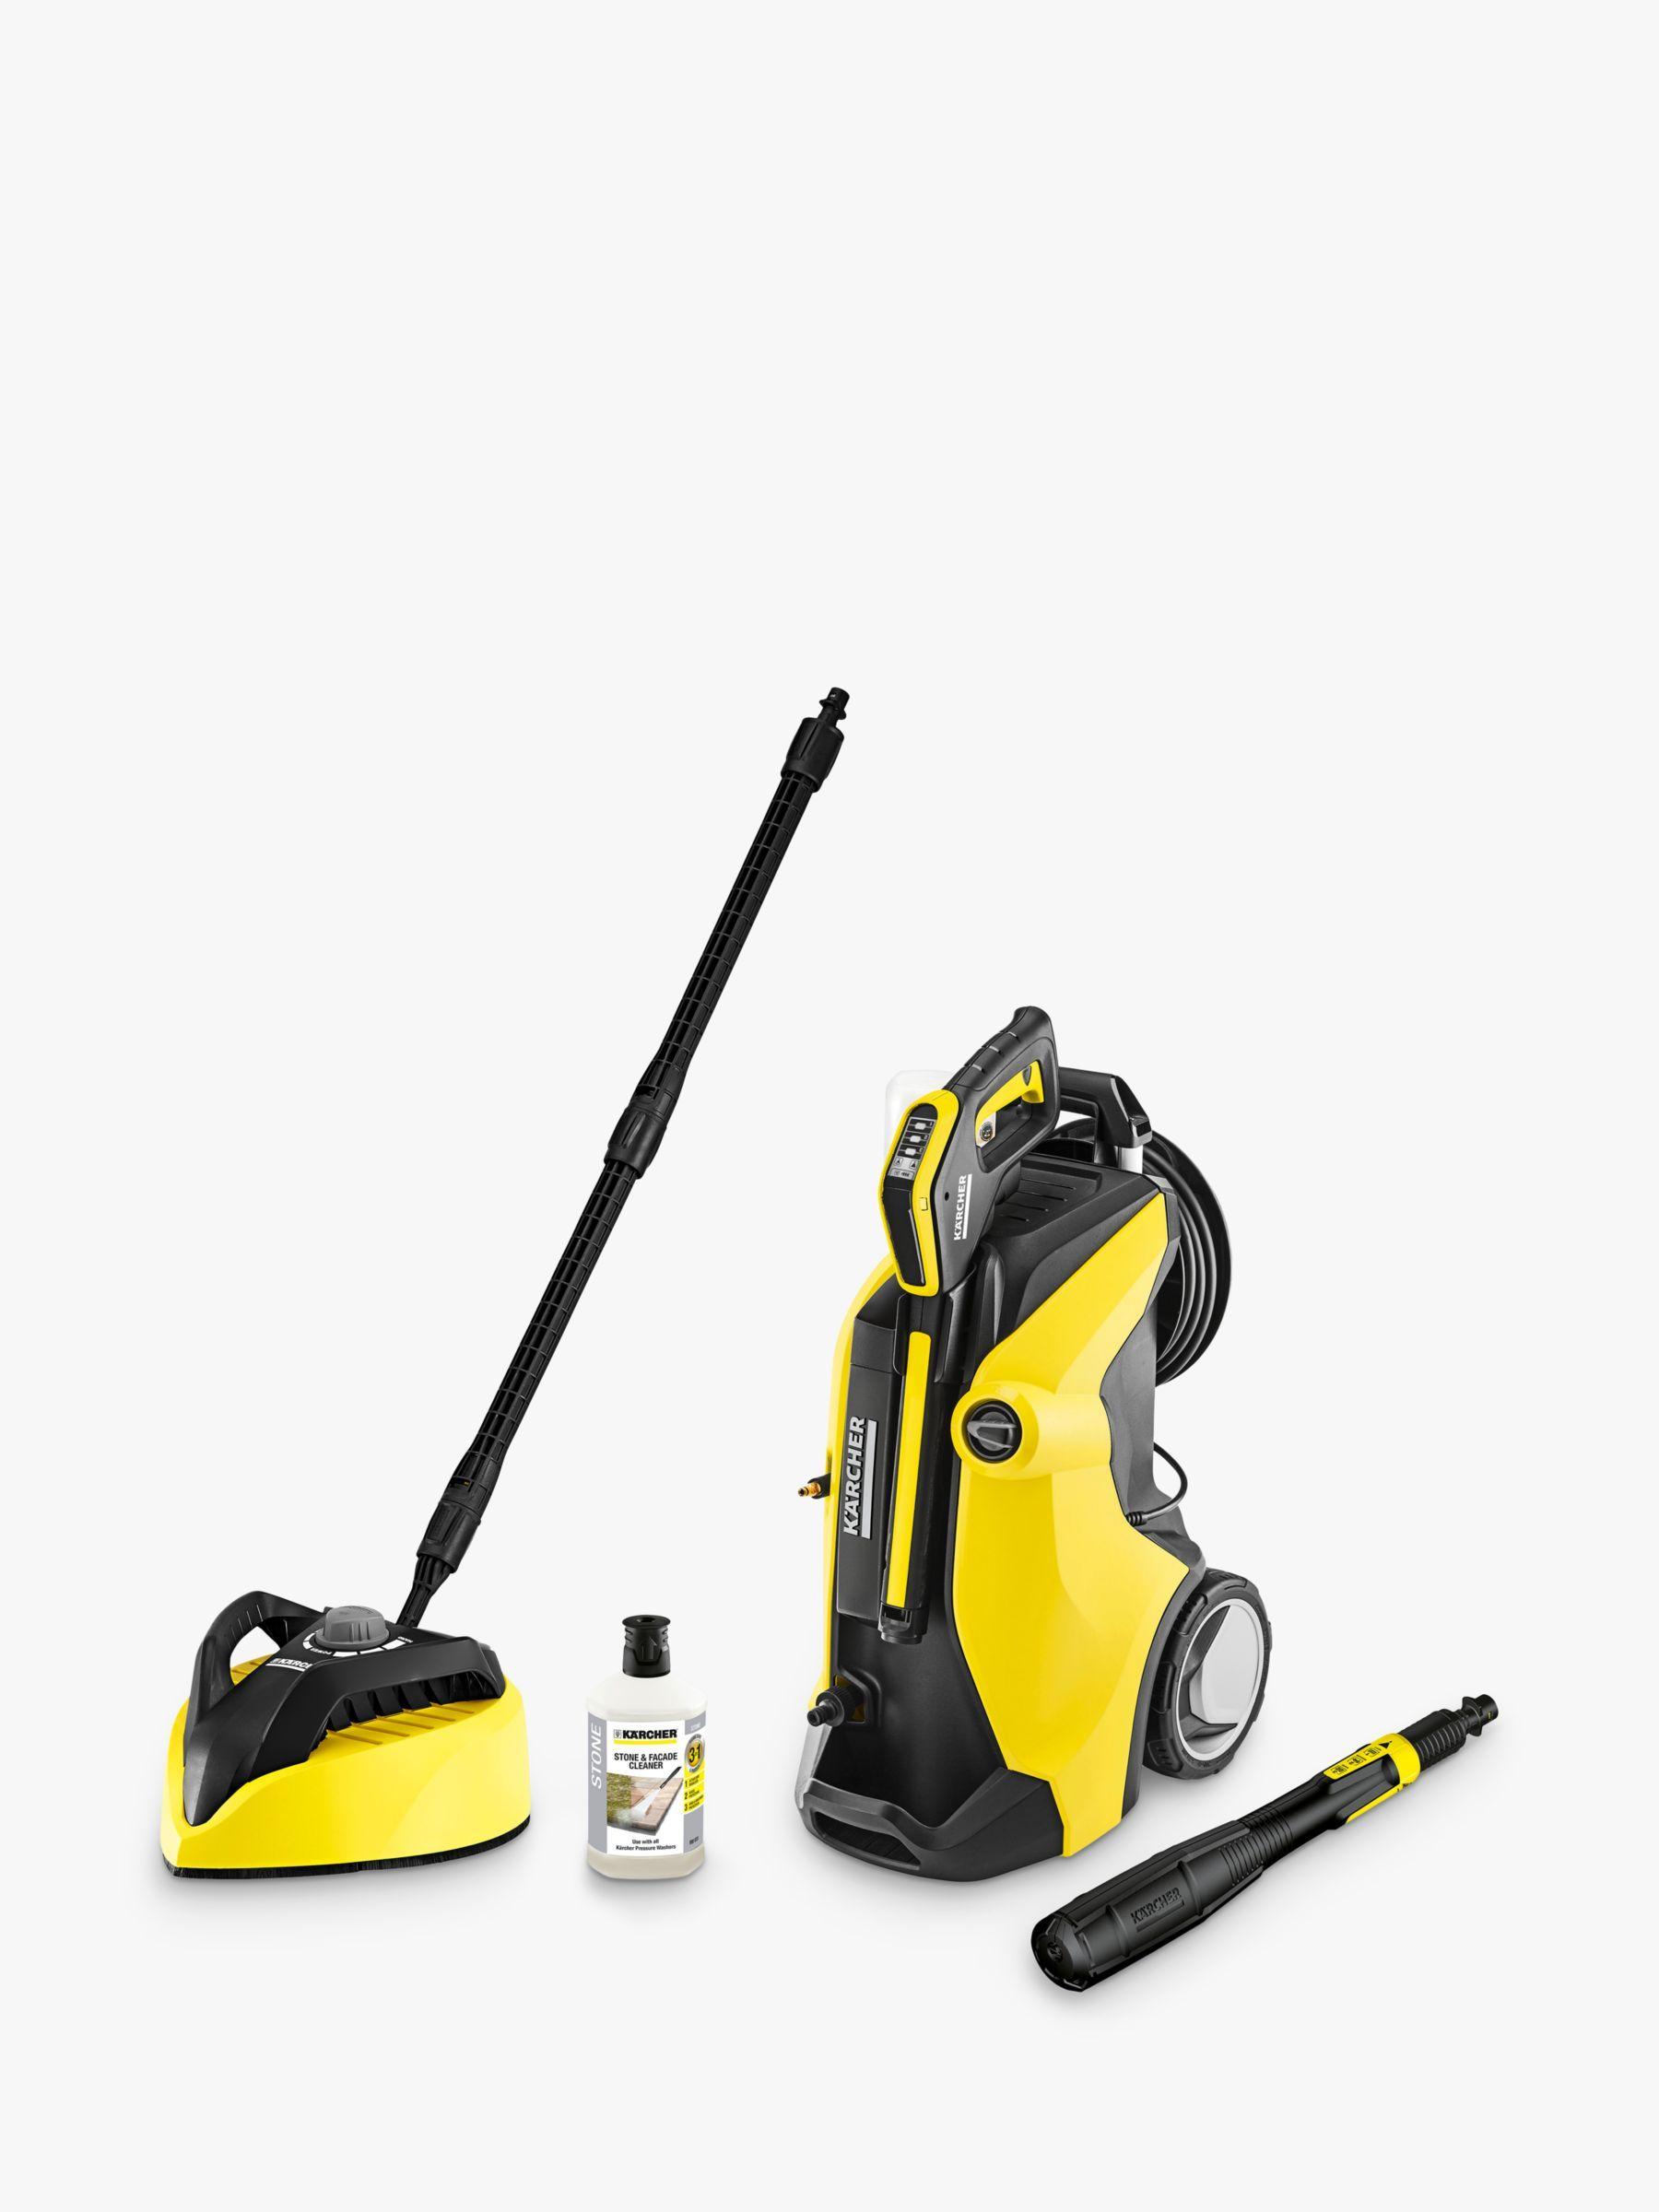 Karcher K7 Premium Full Control Plus Home Pressure Washer Washer Outdoor Power Equipment Garden Power Tools